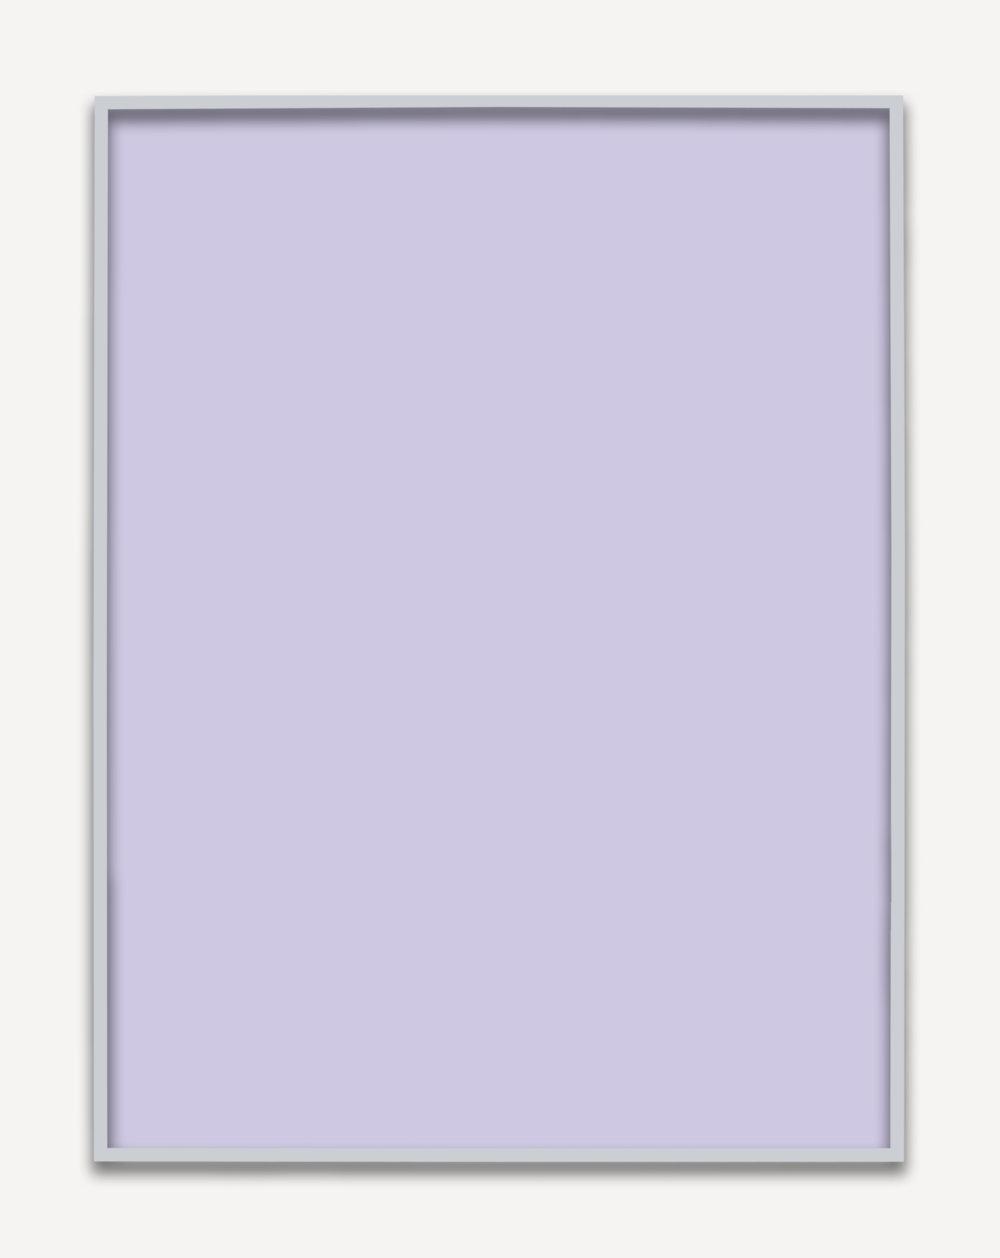 Untitled (Purple Monochrome 04), 2015 unique chromogenic print 153,5 x 123,5 cm - 60 3/8 x 48 5/8 inches (framed)